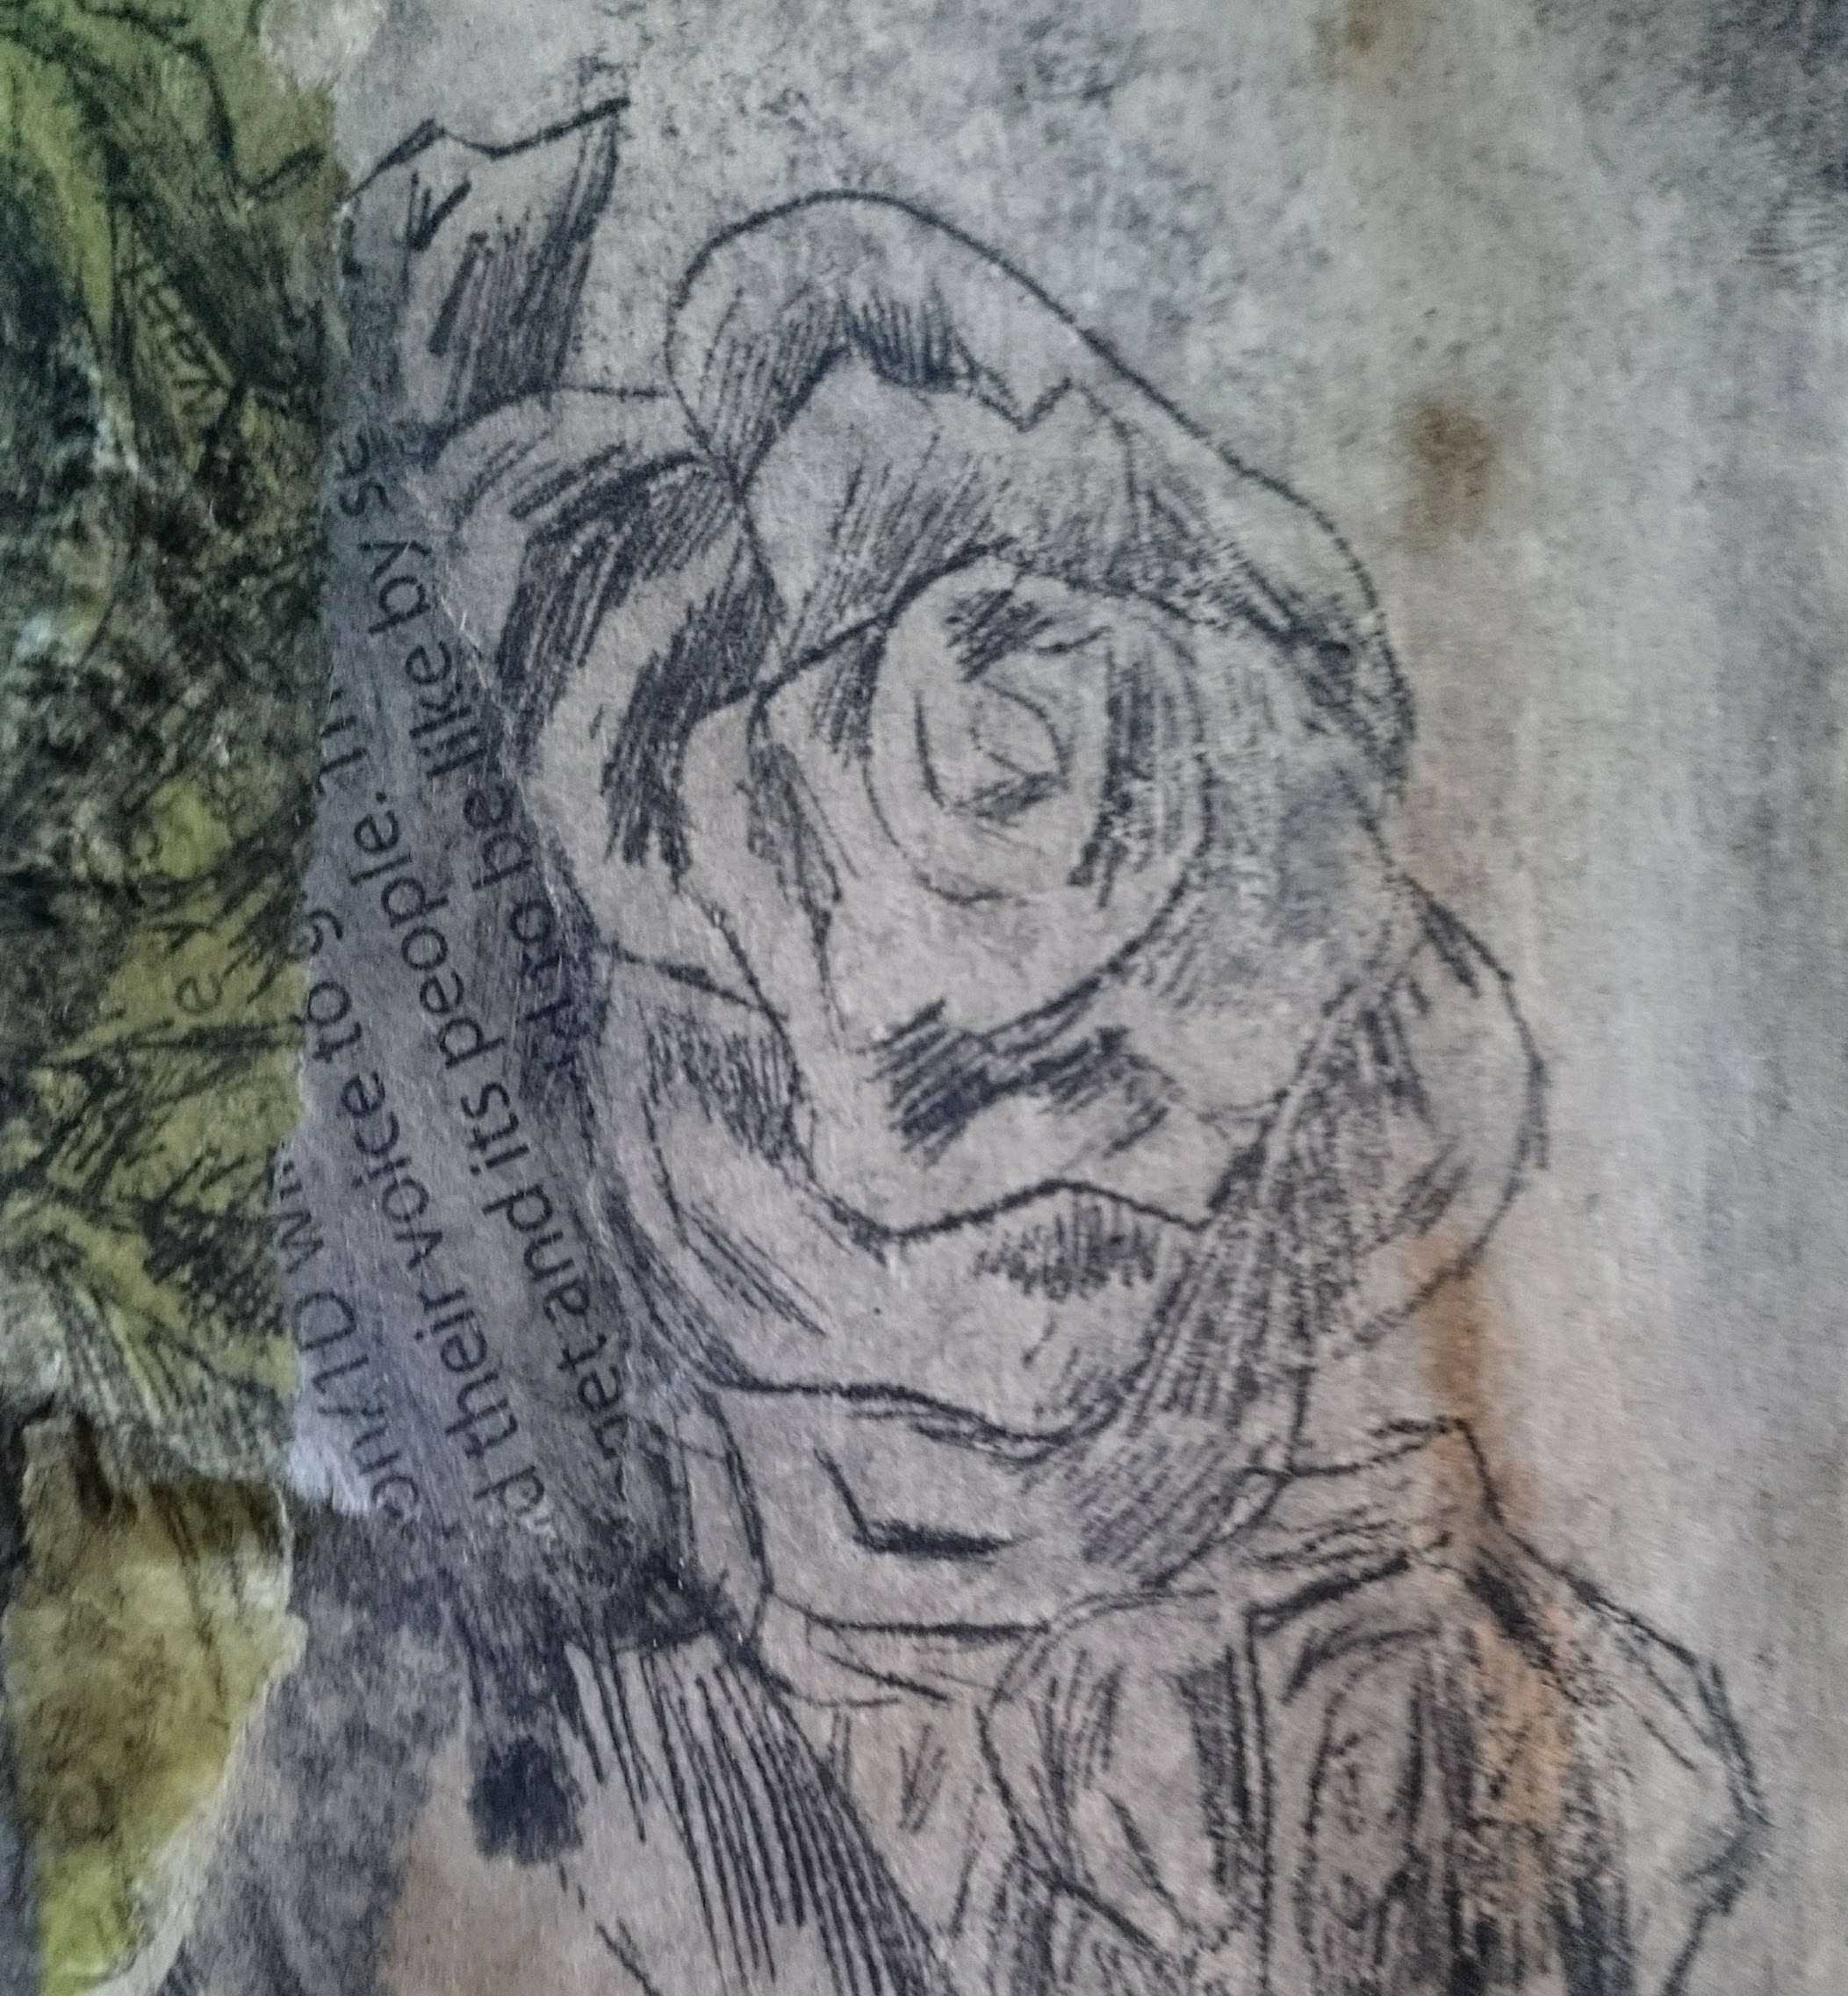 Intaglio print details